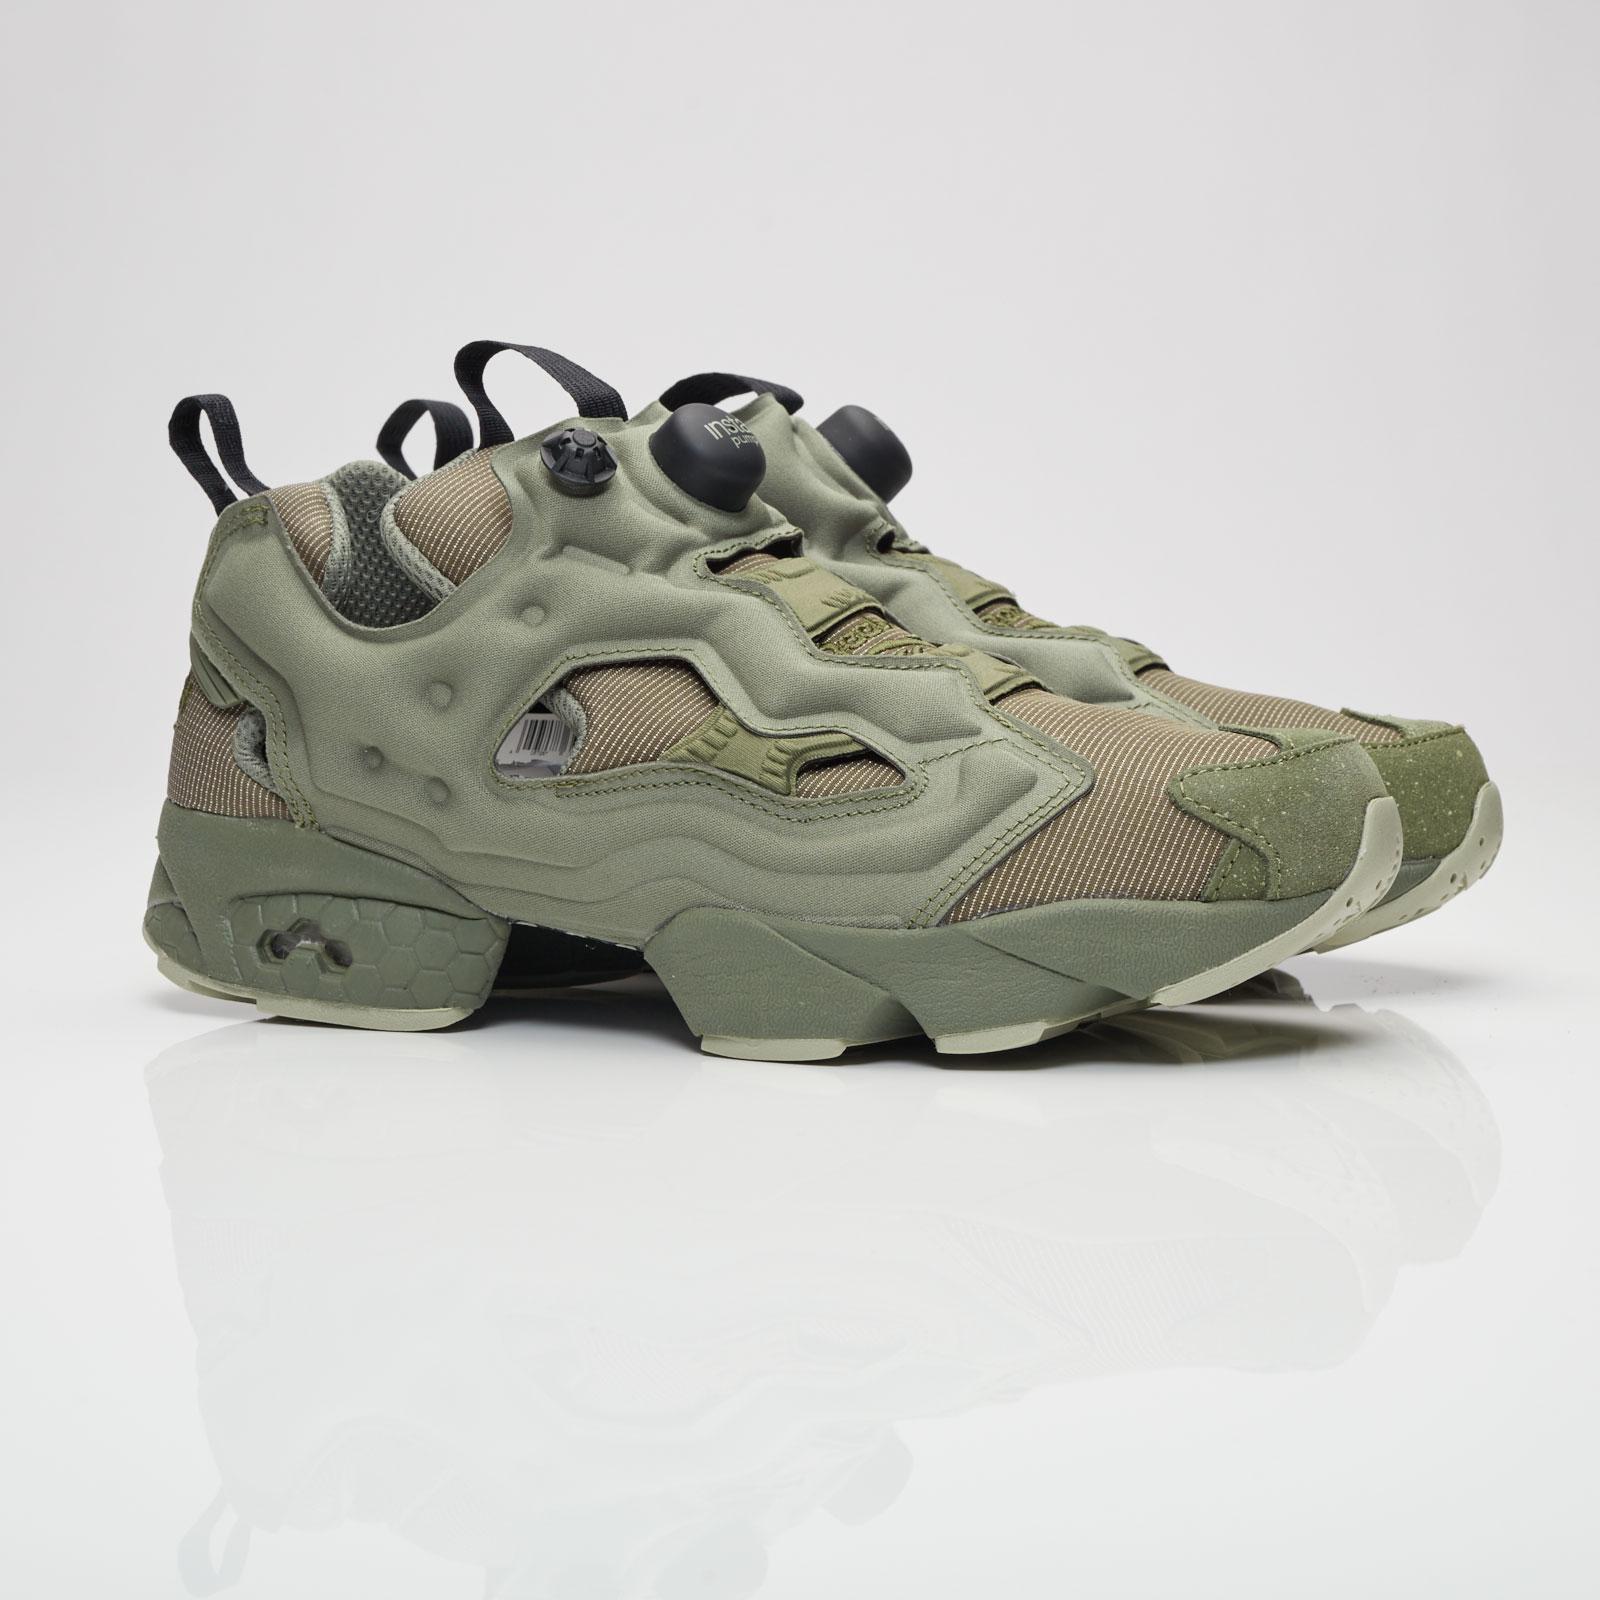 Reebok Instapump Fury Mtp - Bd1501 - Sneakersnstuff ...